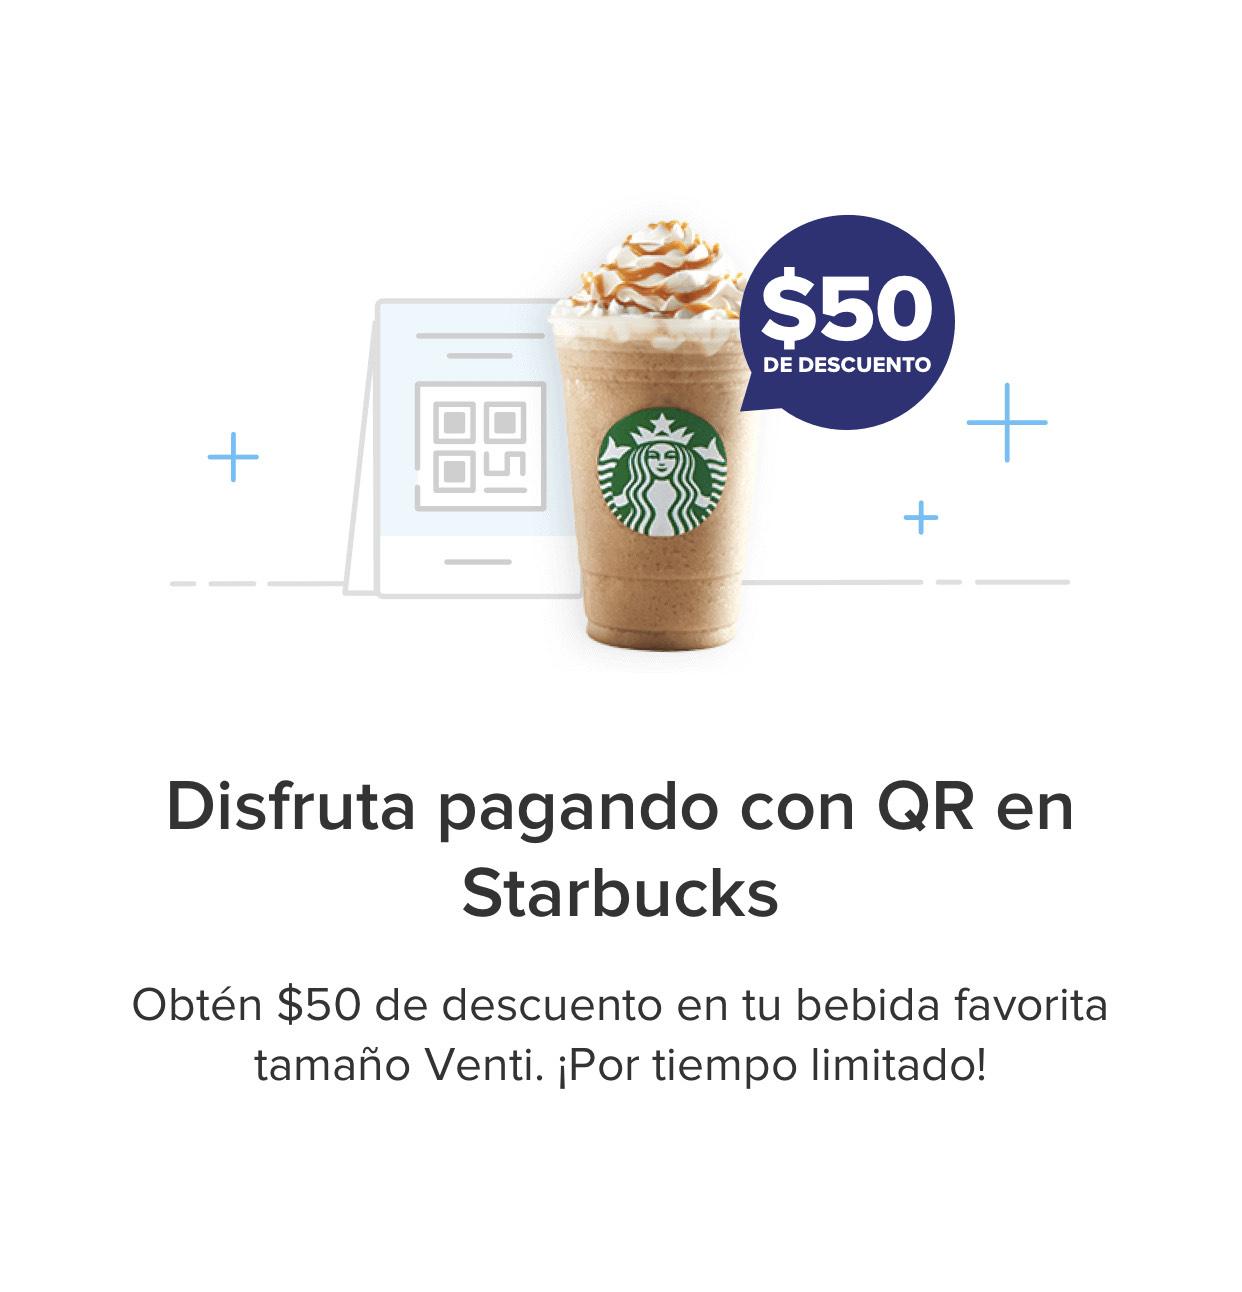 Mercado Pago: $50 de descuento en Starbucks